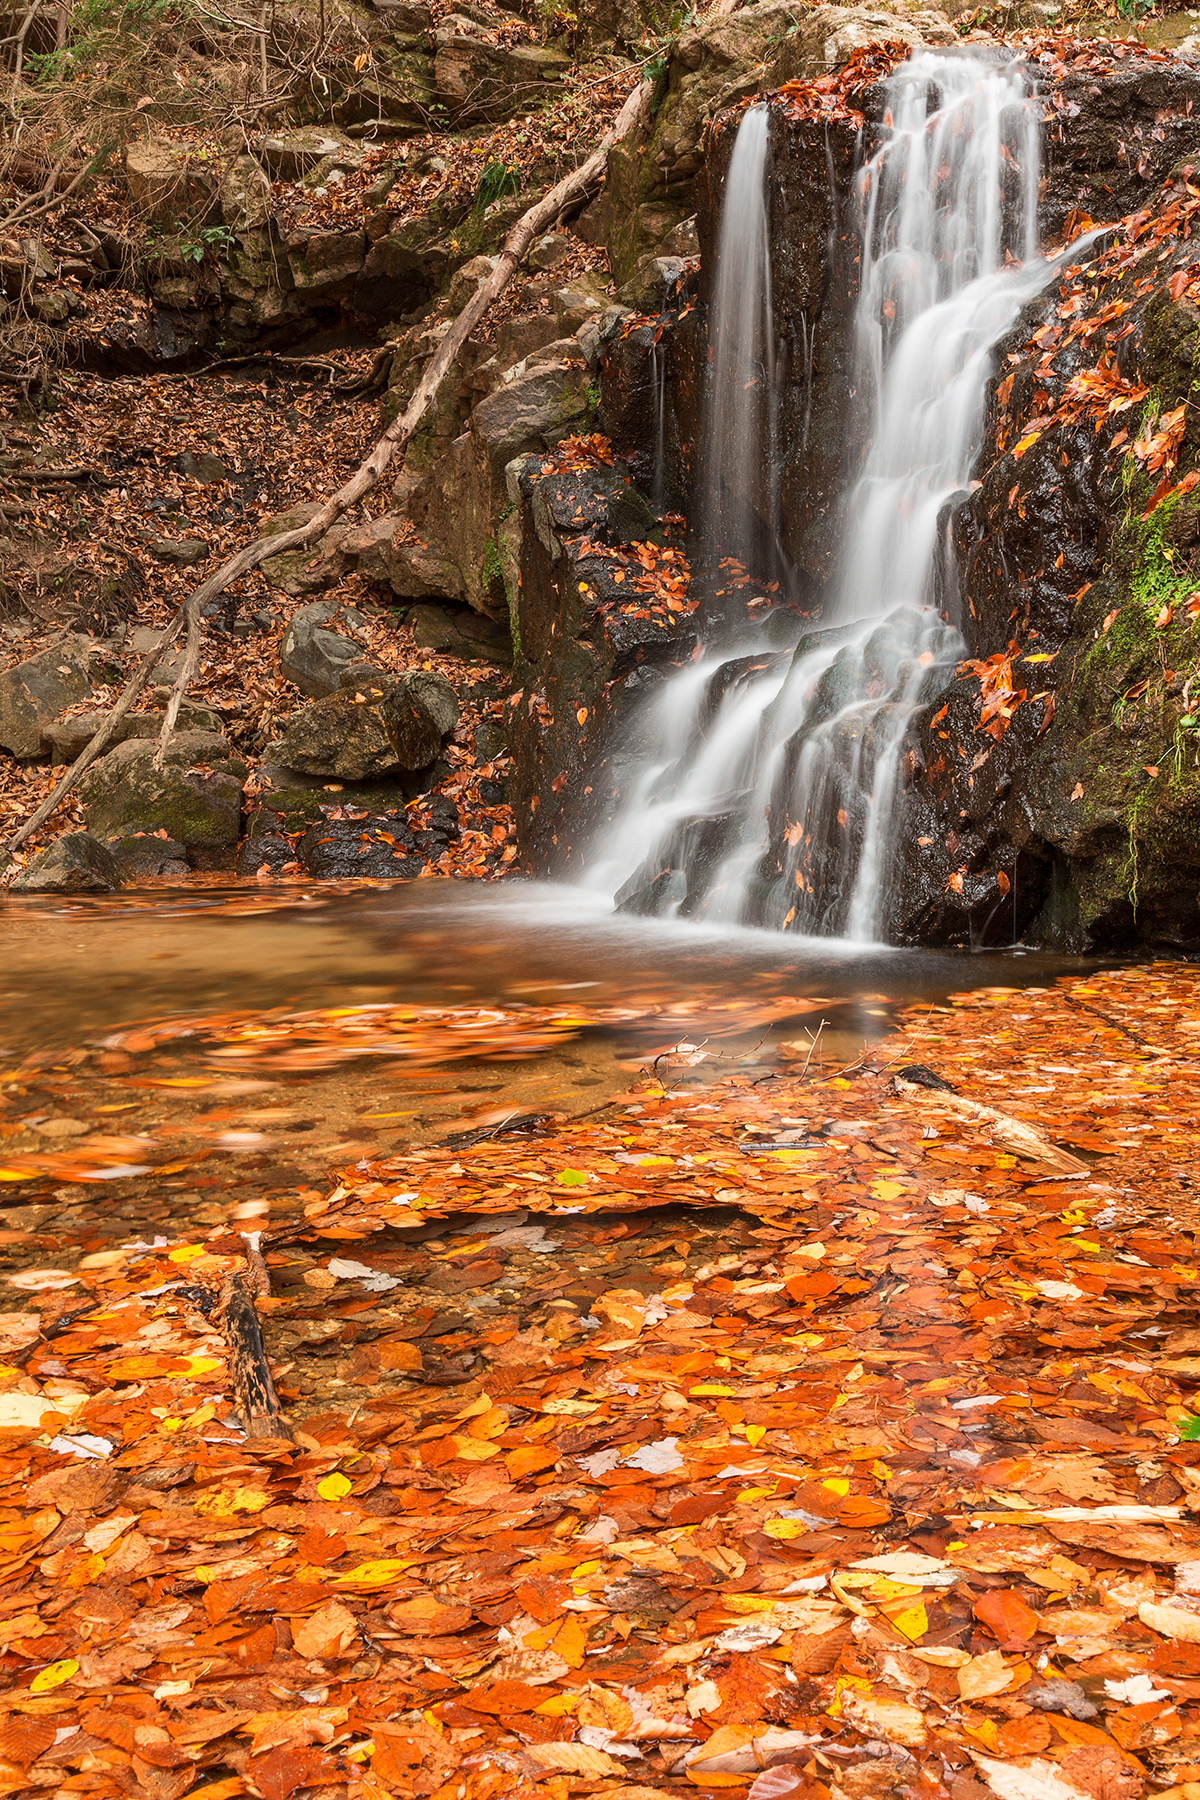 Orange Grove Waterfall, America, Patapsco, Scene, Rocky, HQ Photo